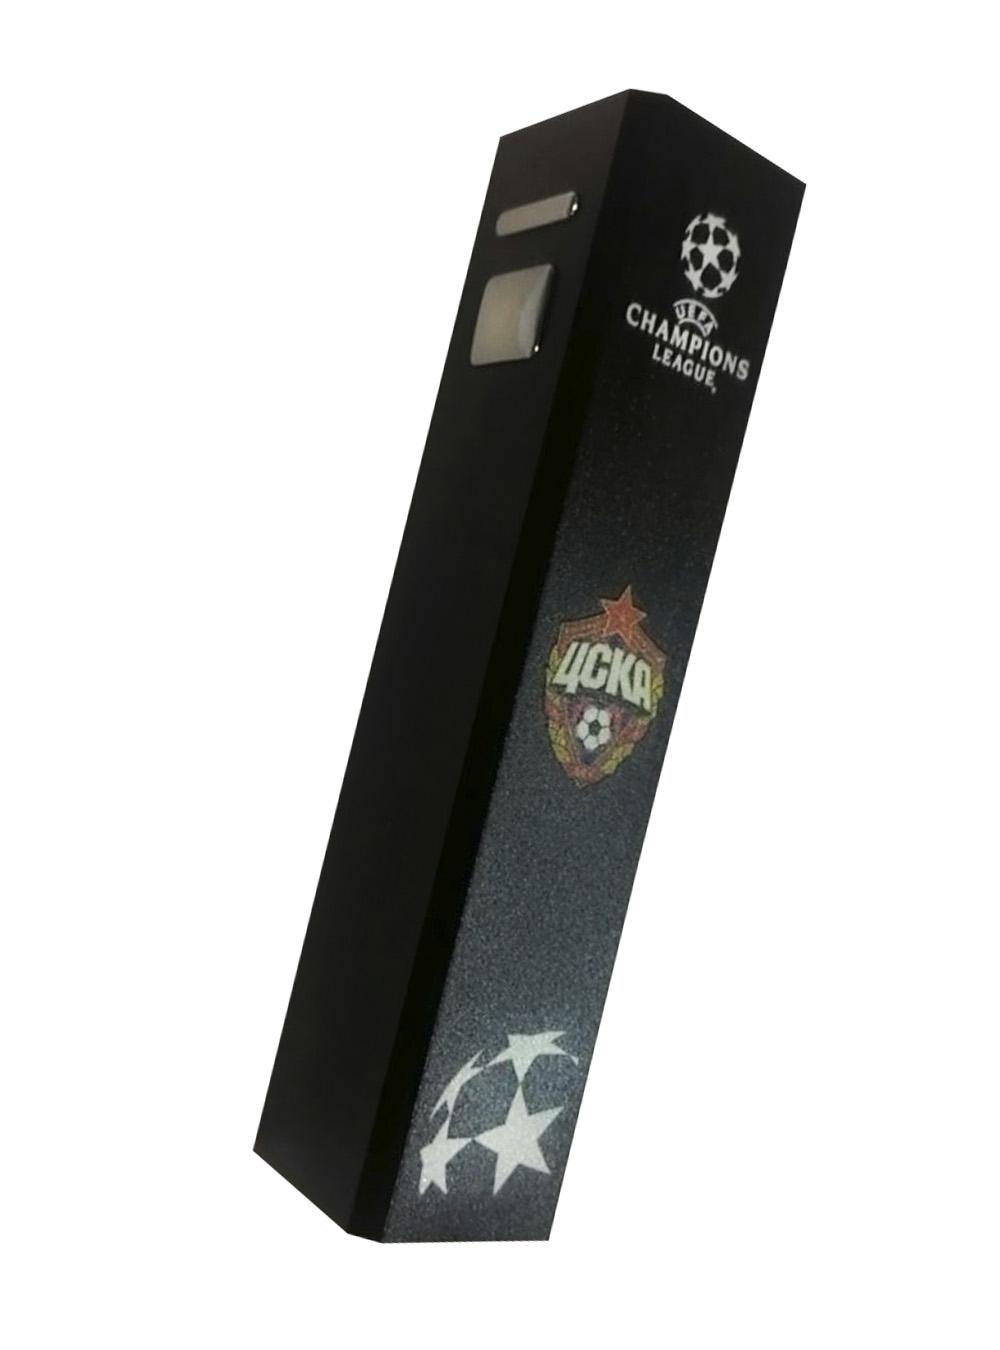 PowerBank внешний аккумулятор Champions LeagueЛига Чемпионов<br>PowerBank внешний аккумулятор Champions League<br>